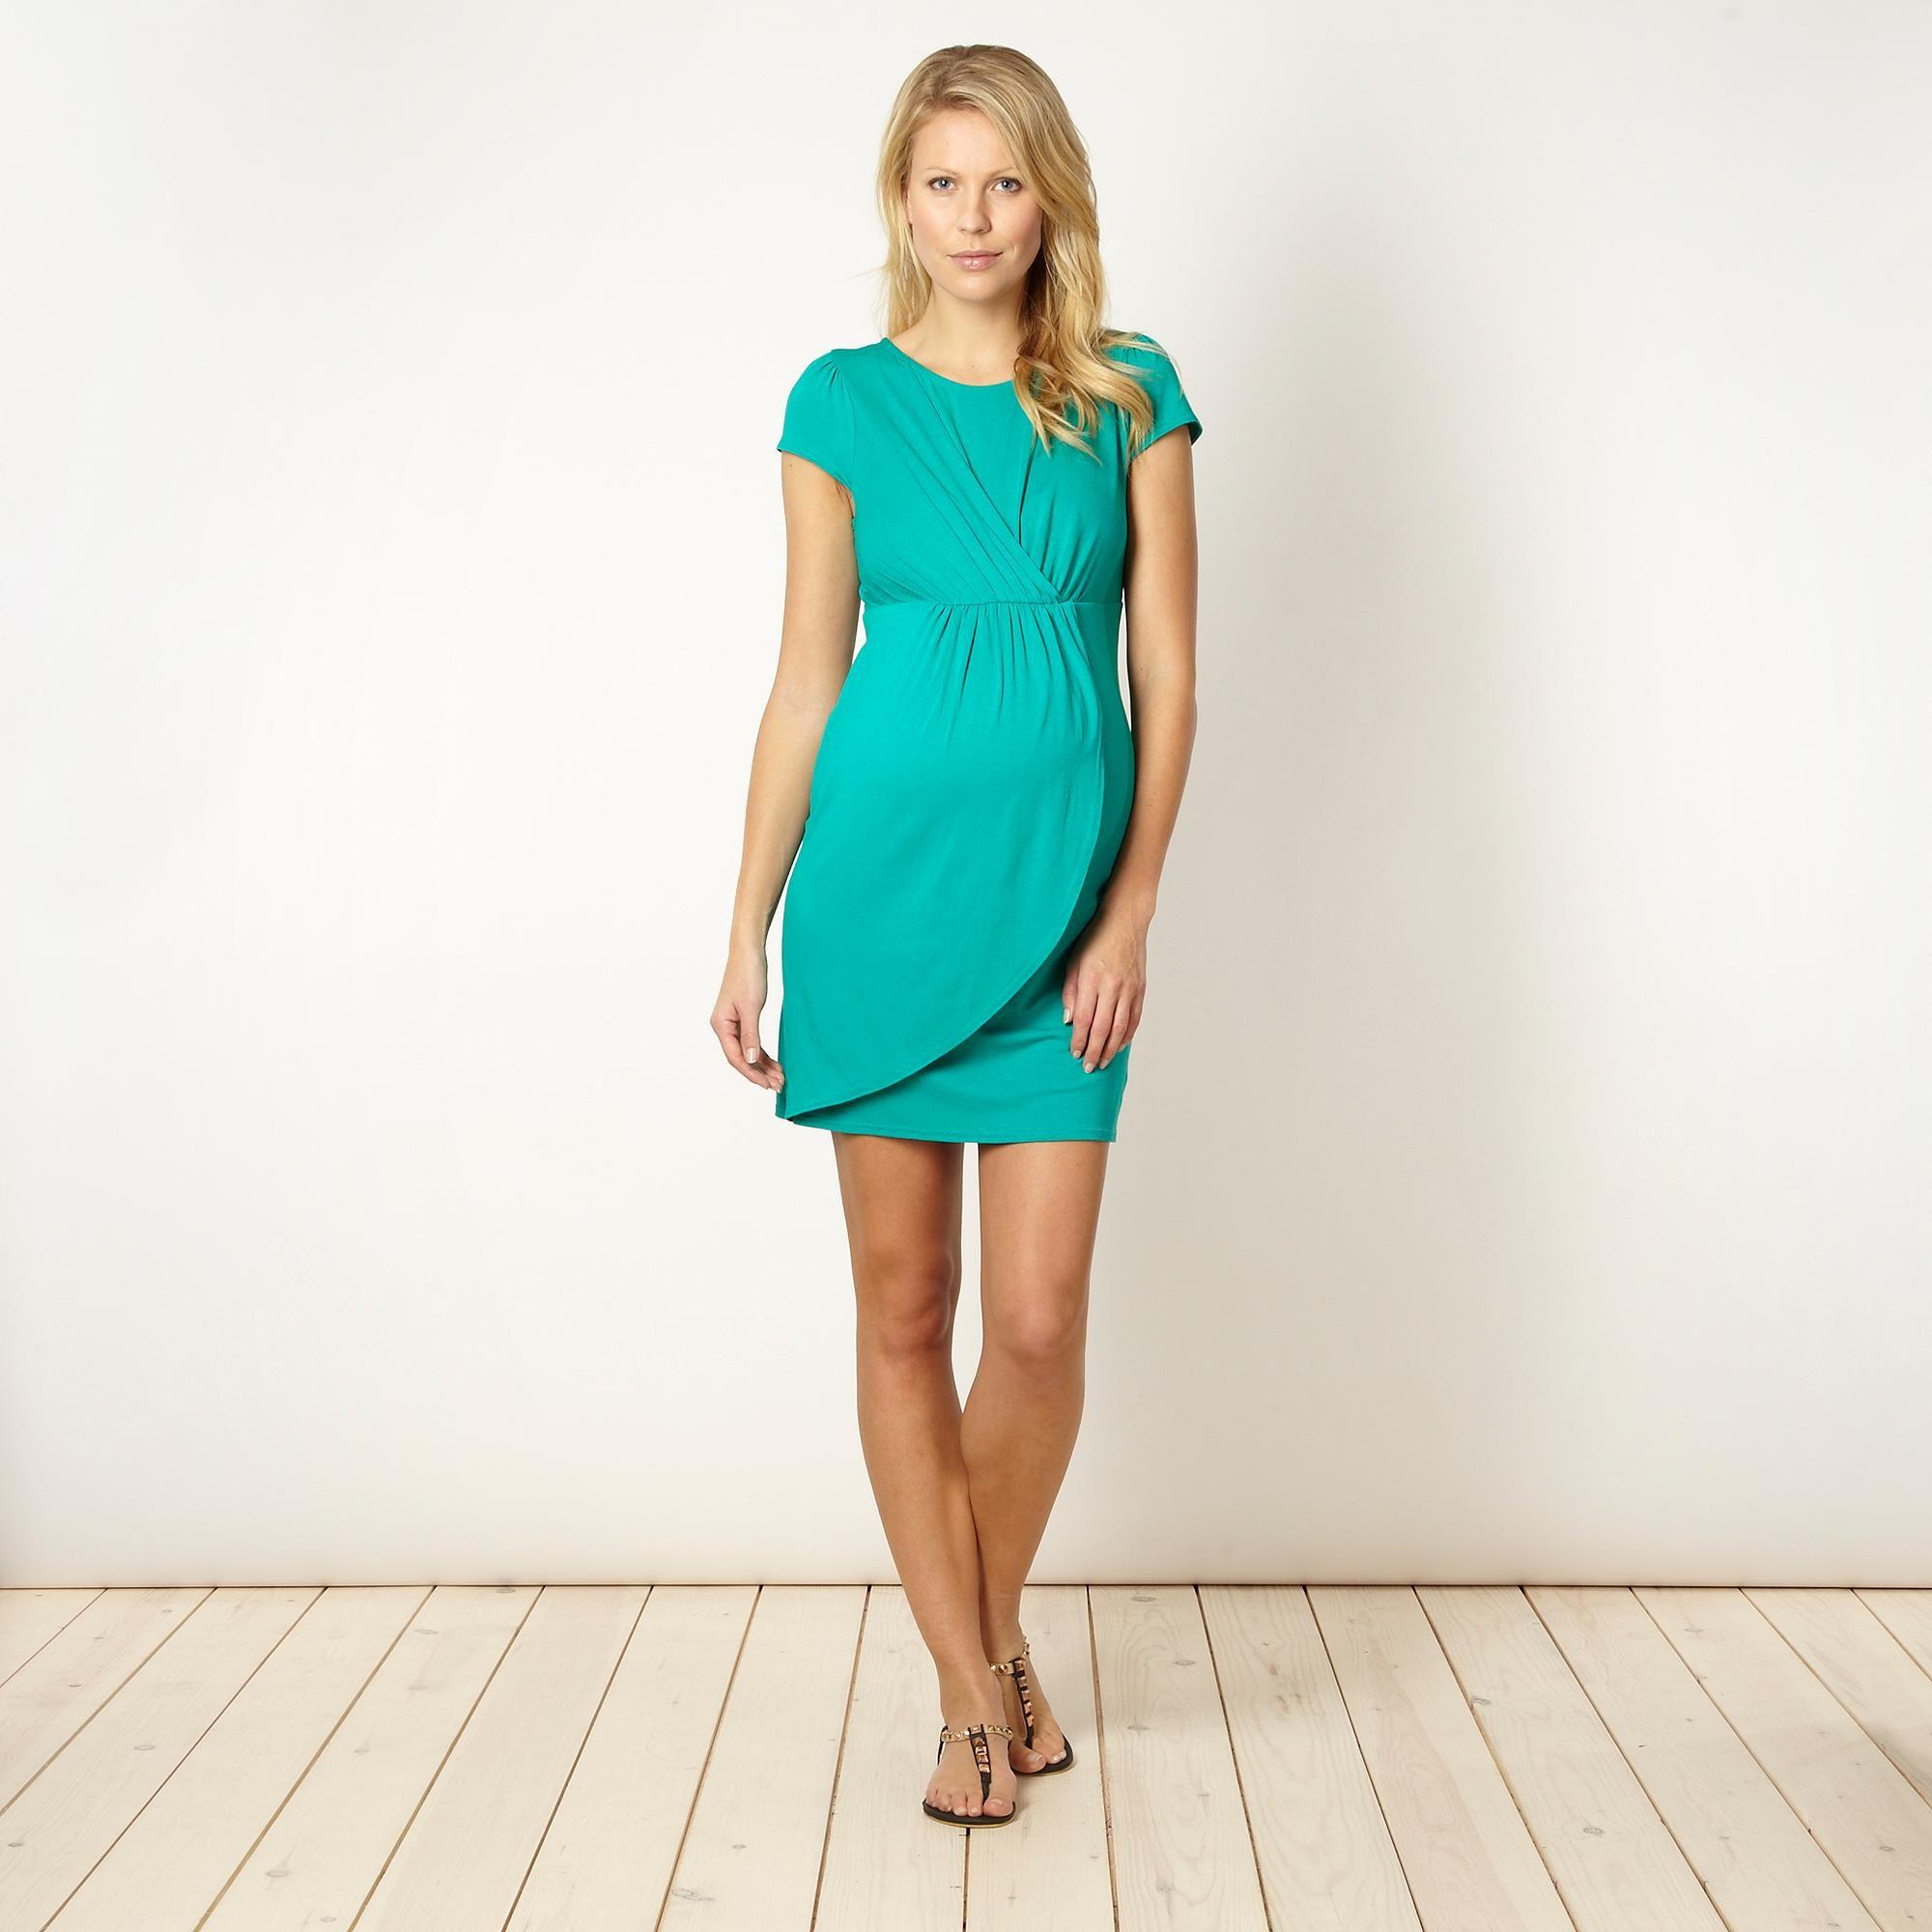 Maternity Dresses Debenhams Images - Braidsmaid Dress, Cocktail ...